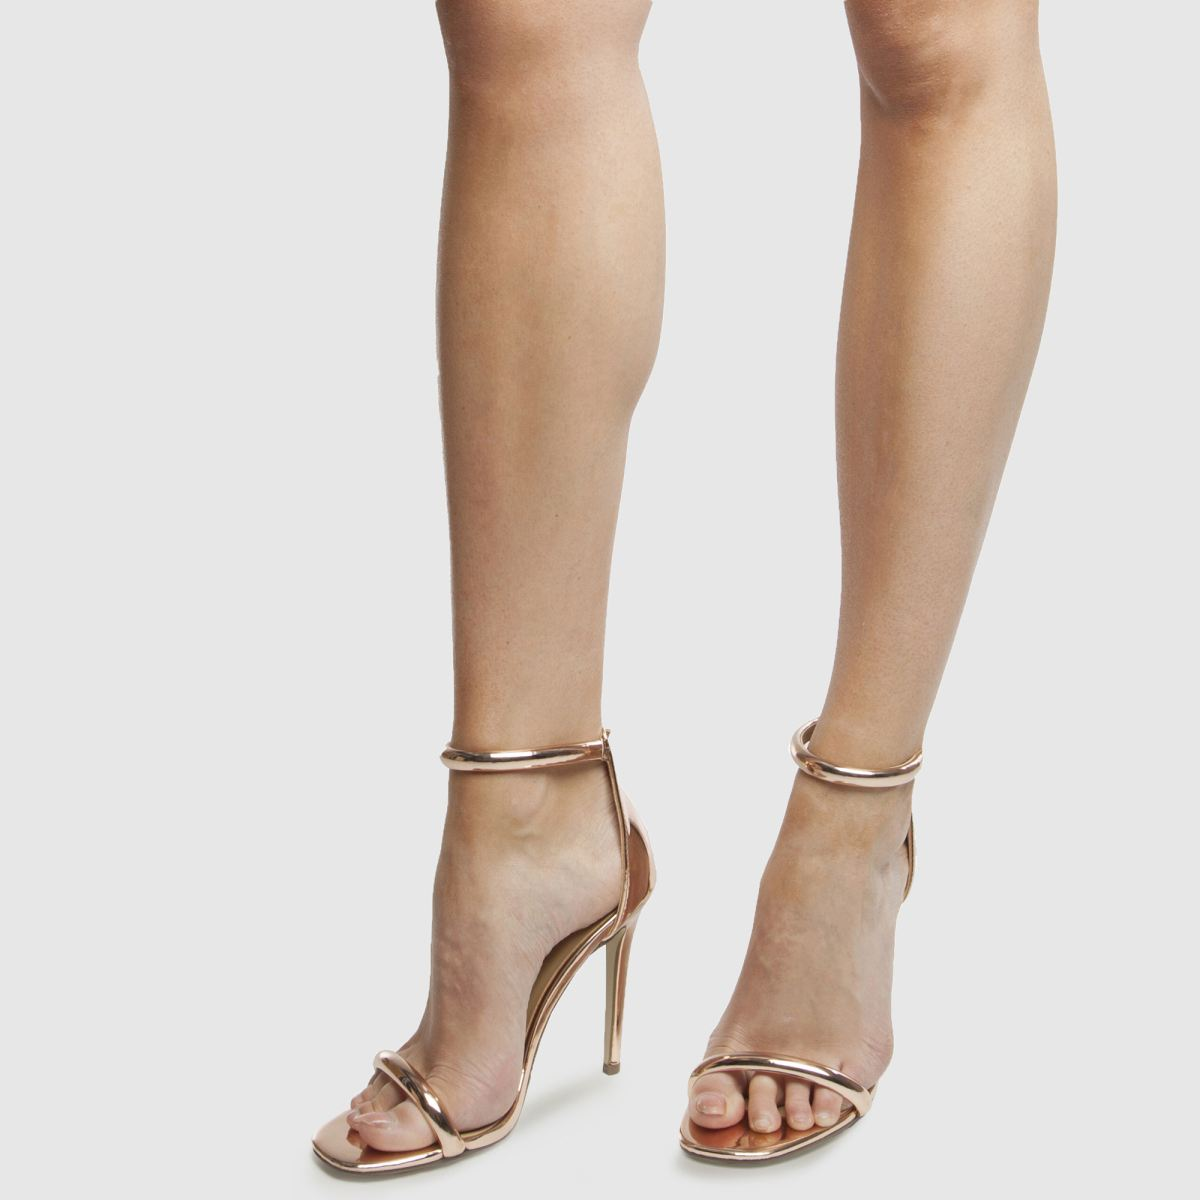 Damen Rosegold missguided Strap Barely There High Heels beliebte | schuh Gute Qualität beliebte Heels Schuhe 3b472b